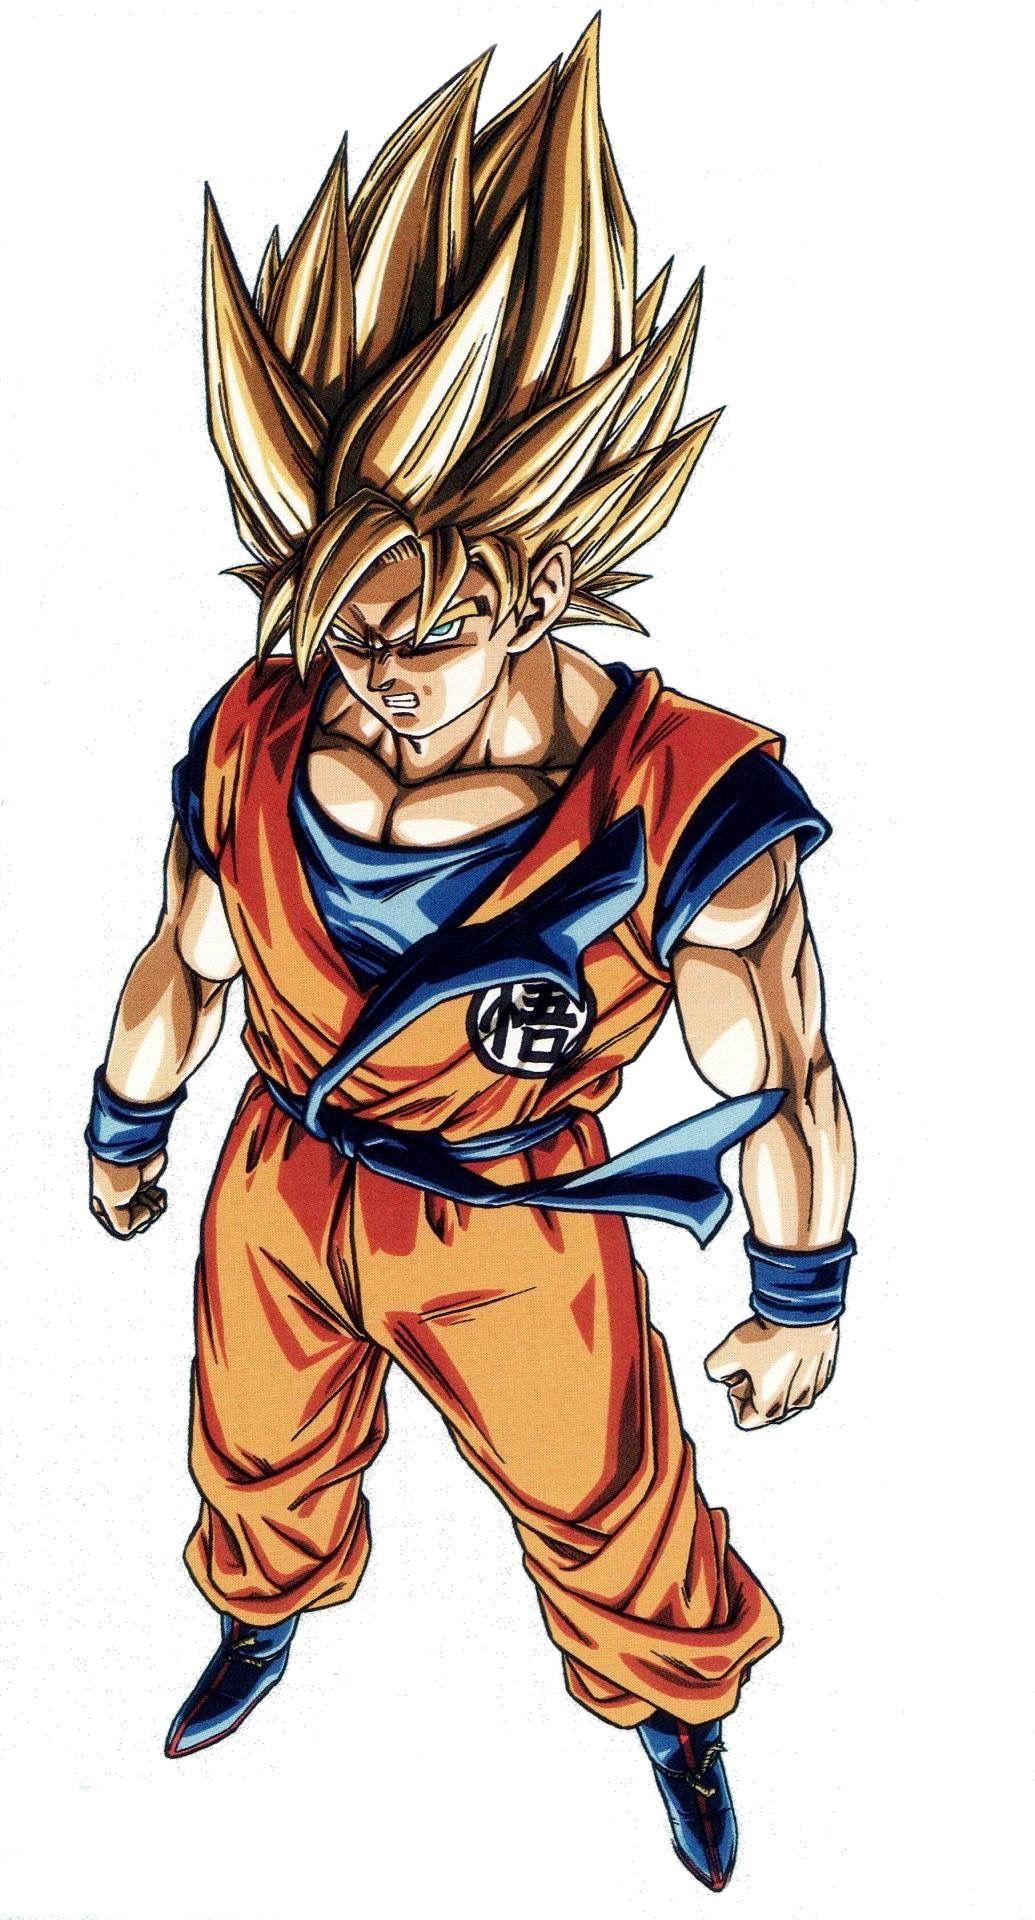 Goku Ssj Visit Now For 3d Dragon Ball Z Compression Shirts Now On Sale Dragonball Dbz Dragonballsup Dragon Ball Z Dragon Ball Goku Dragon Ball Wallpapers